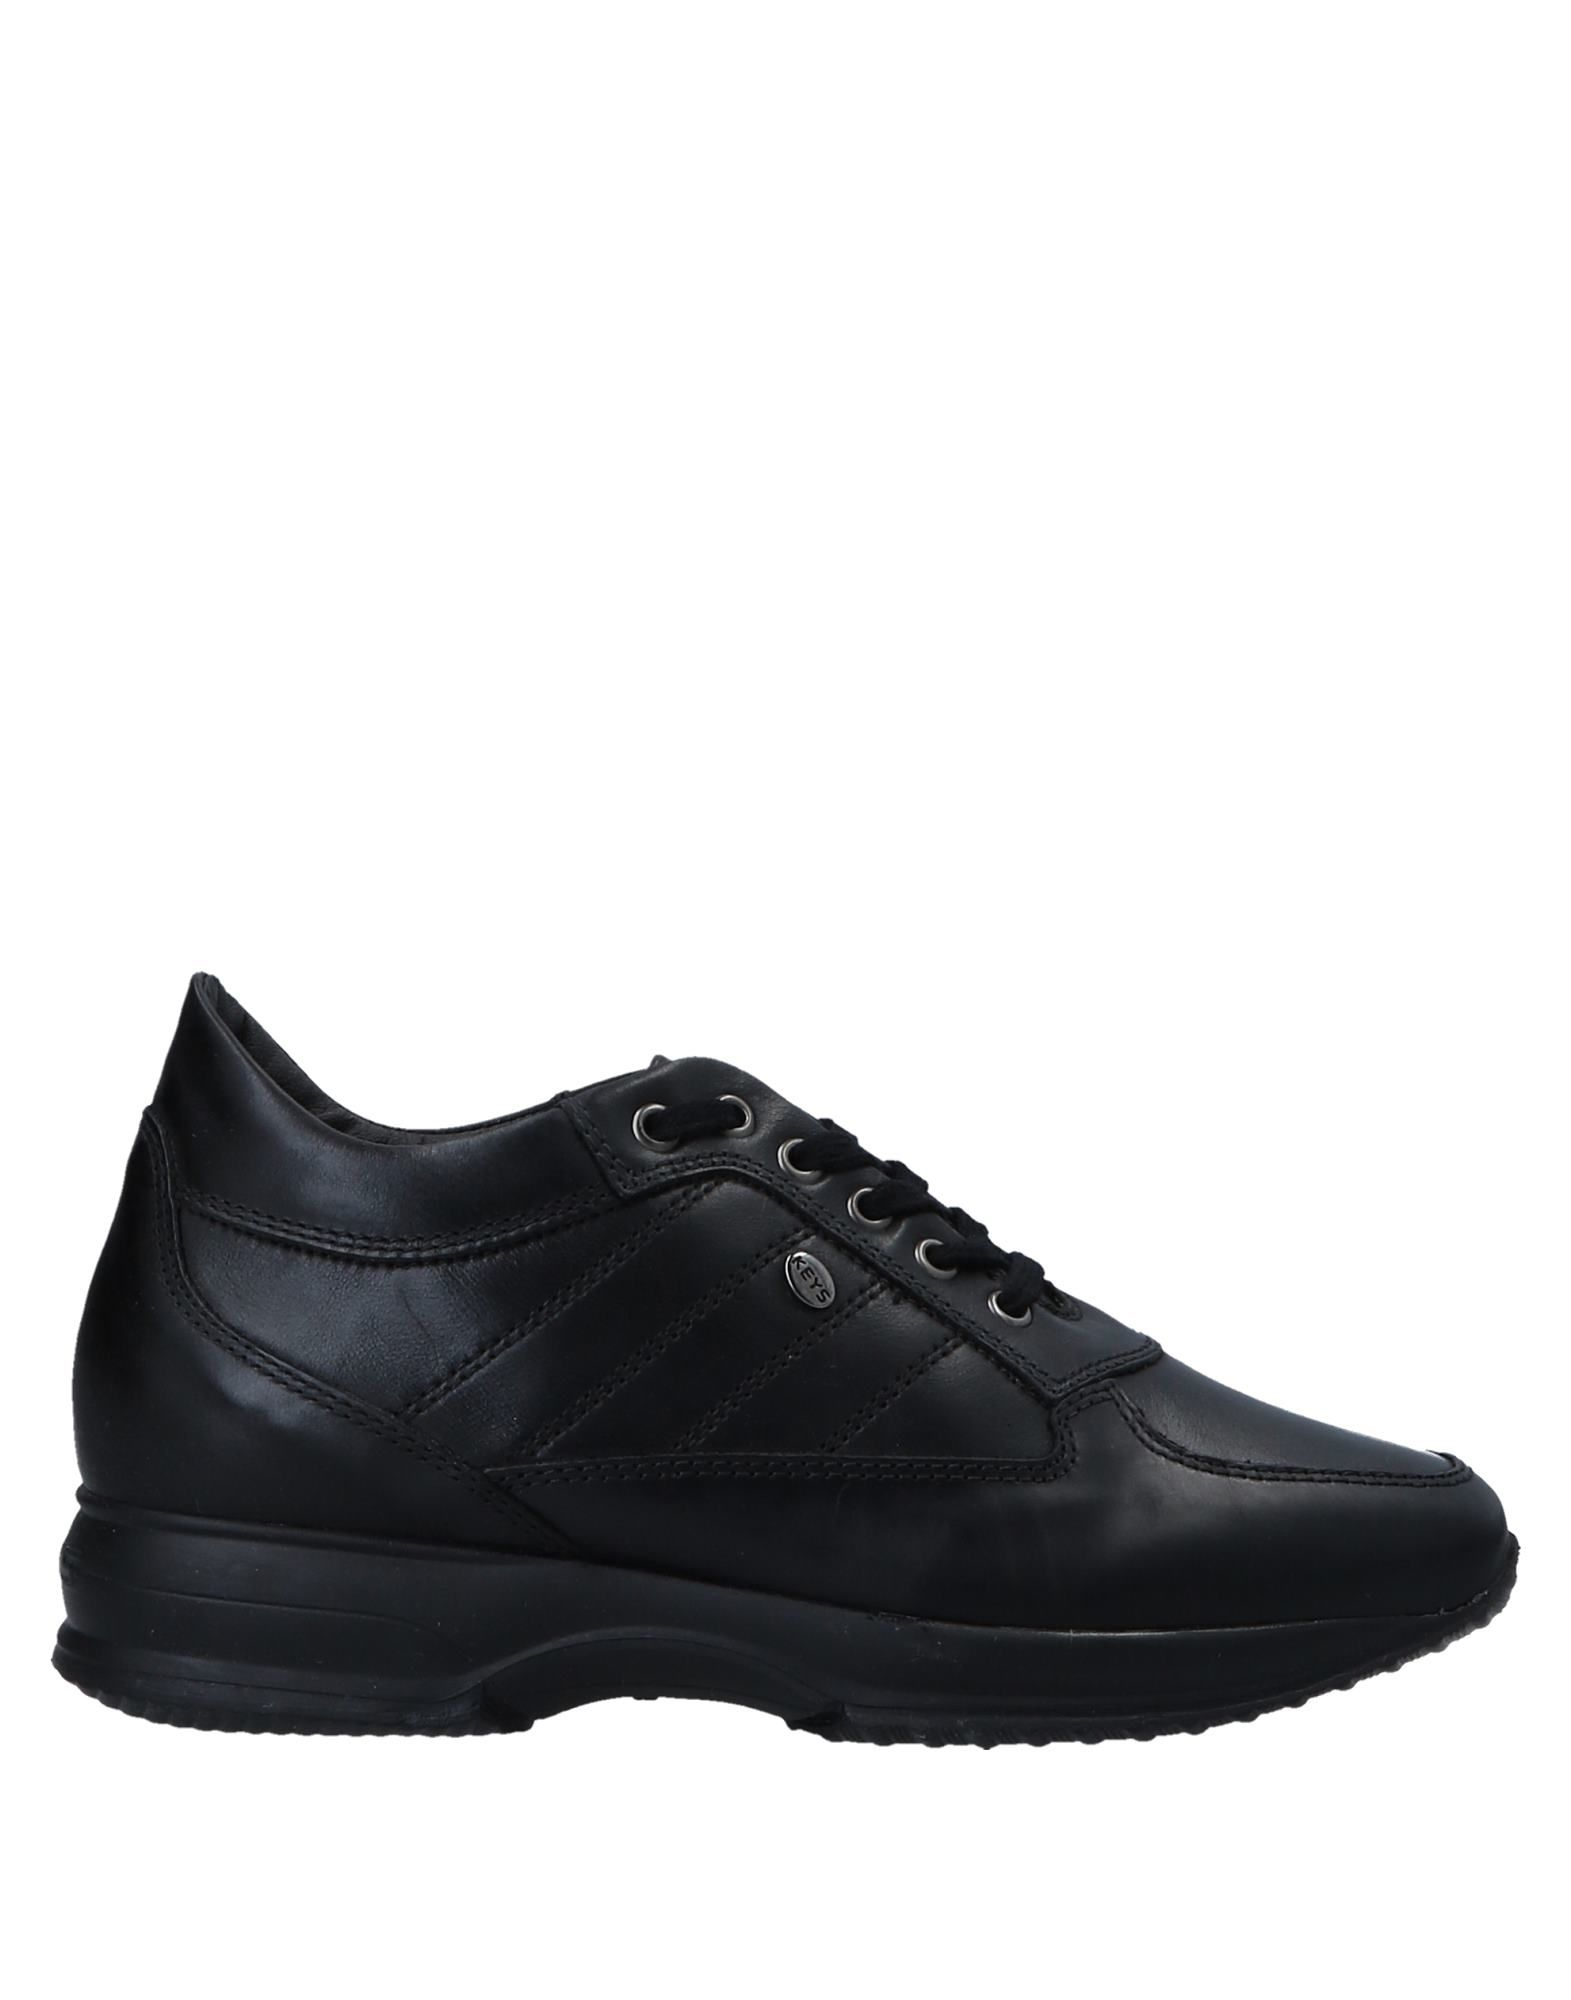 Keys Sneakers  Damen  Sneakers 11552489DQ Gute Qualität beliebte Schuhe 4f63e4